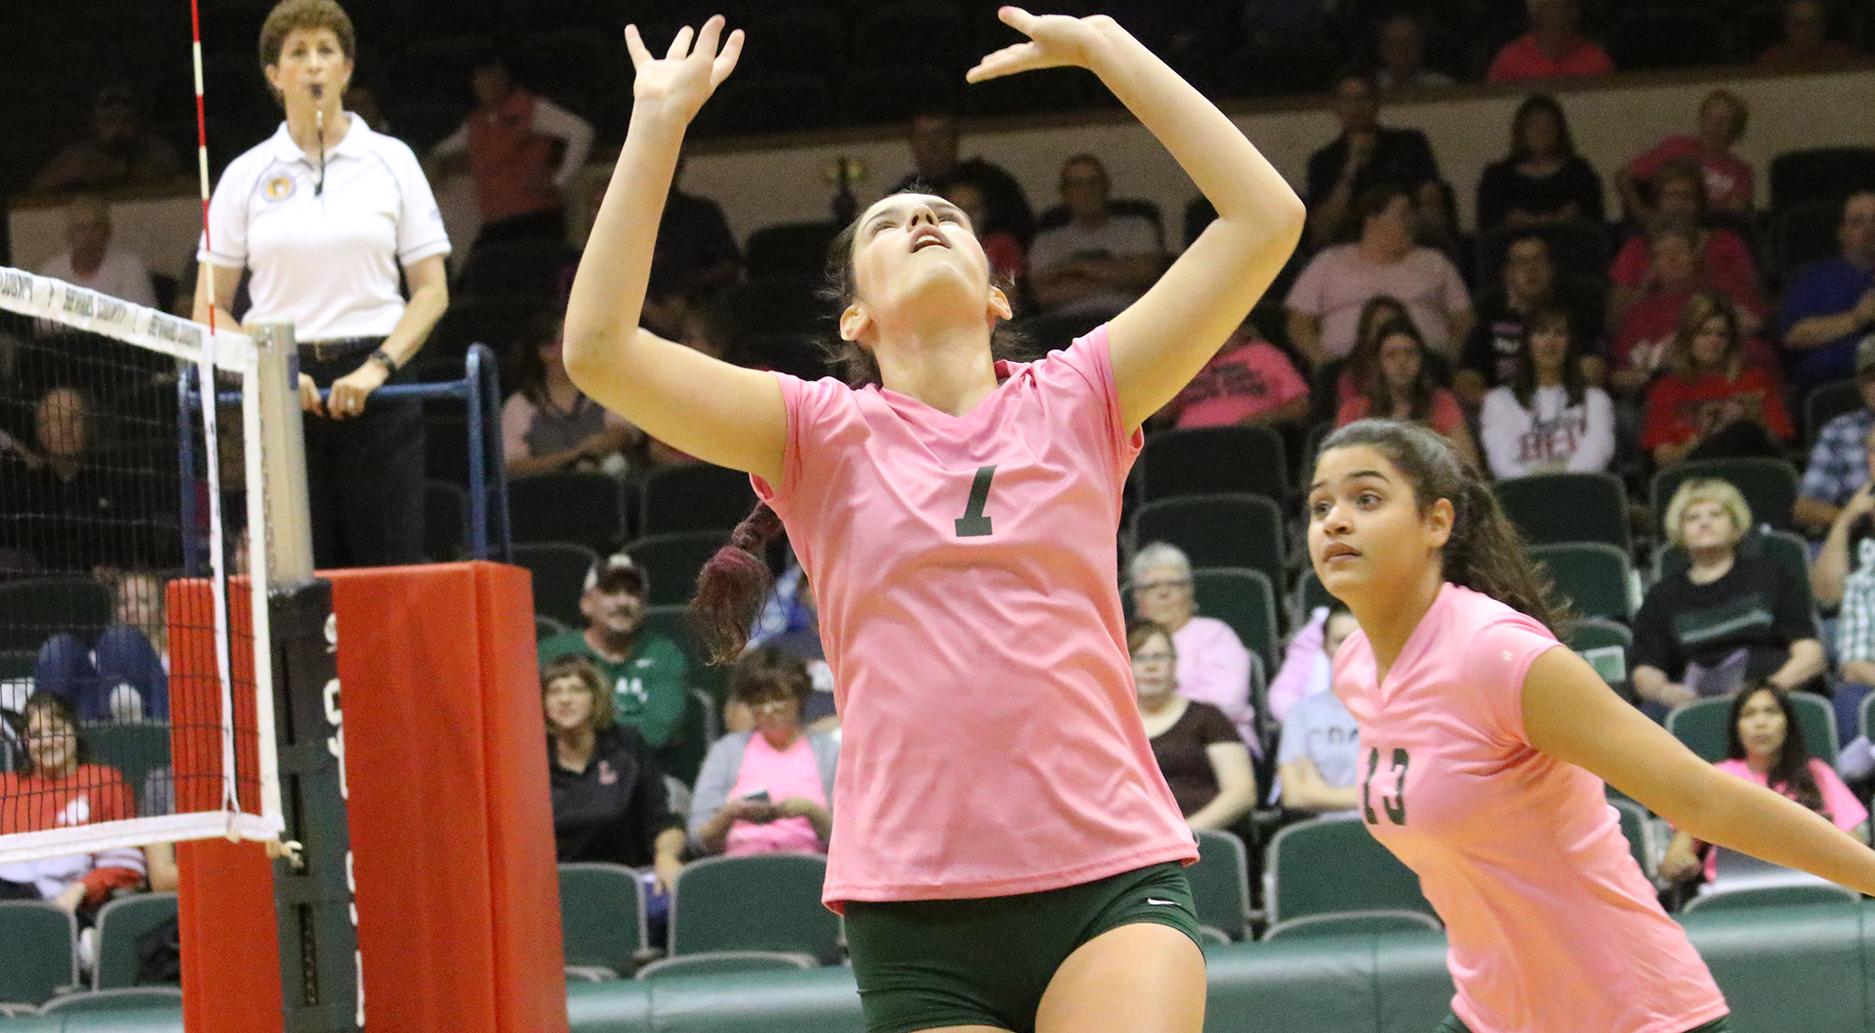 Saints Inch Closer to Jayhawk Volleyball Title